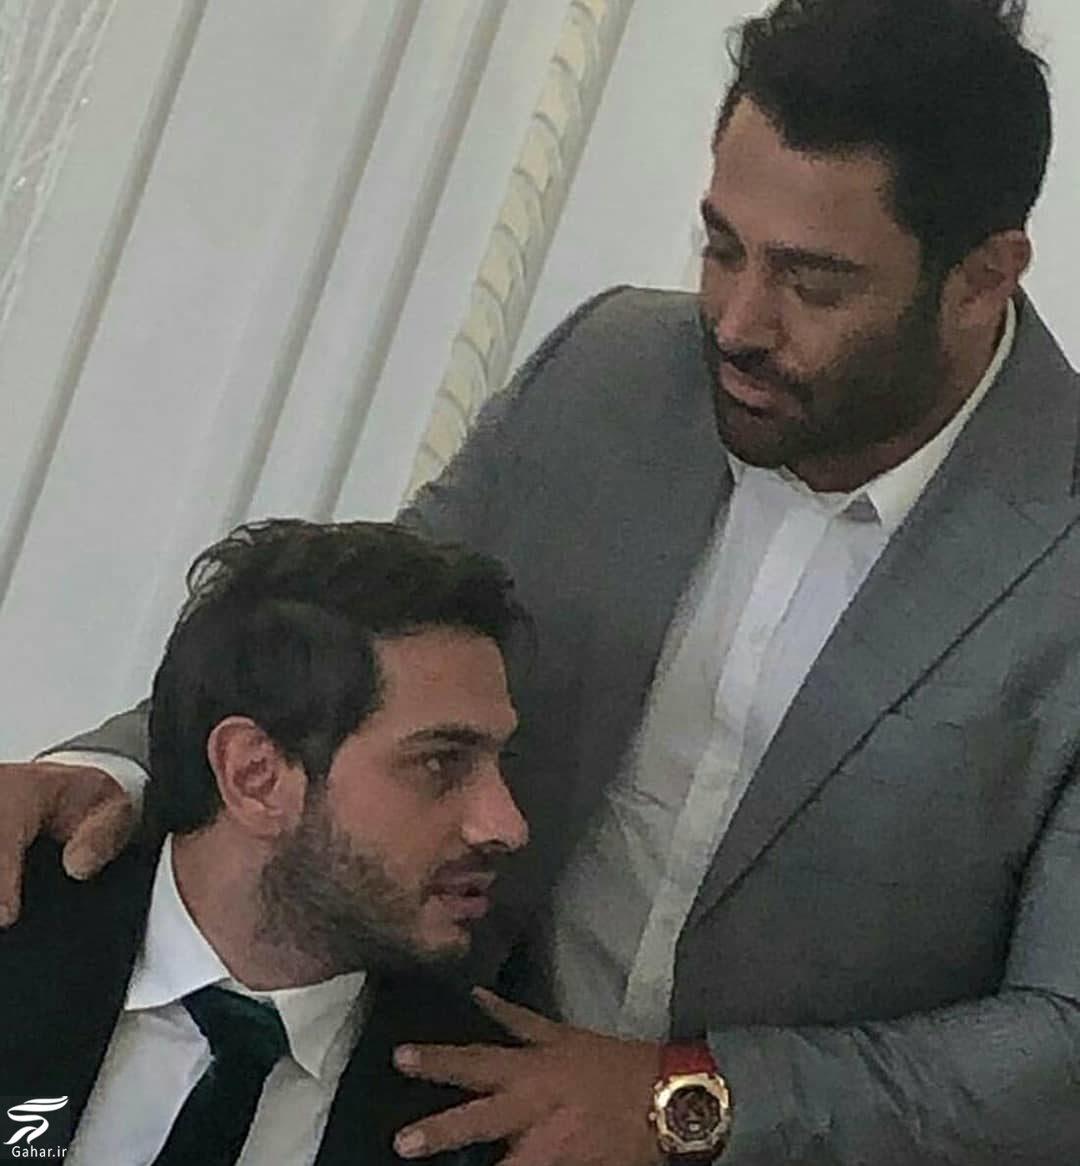 210536 Gahar ir عکسهای محمدرضا گلزار در مراسم عقد برادرش